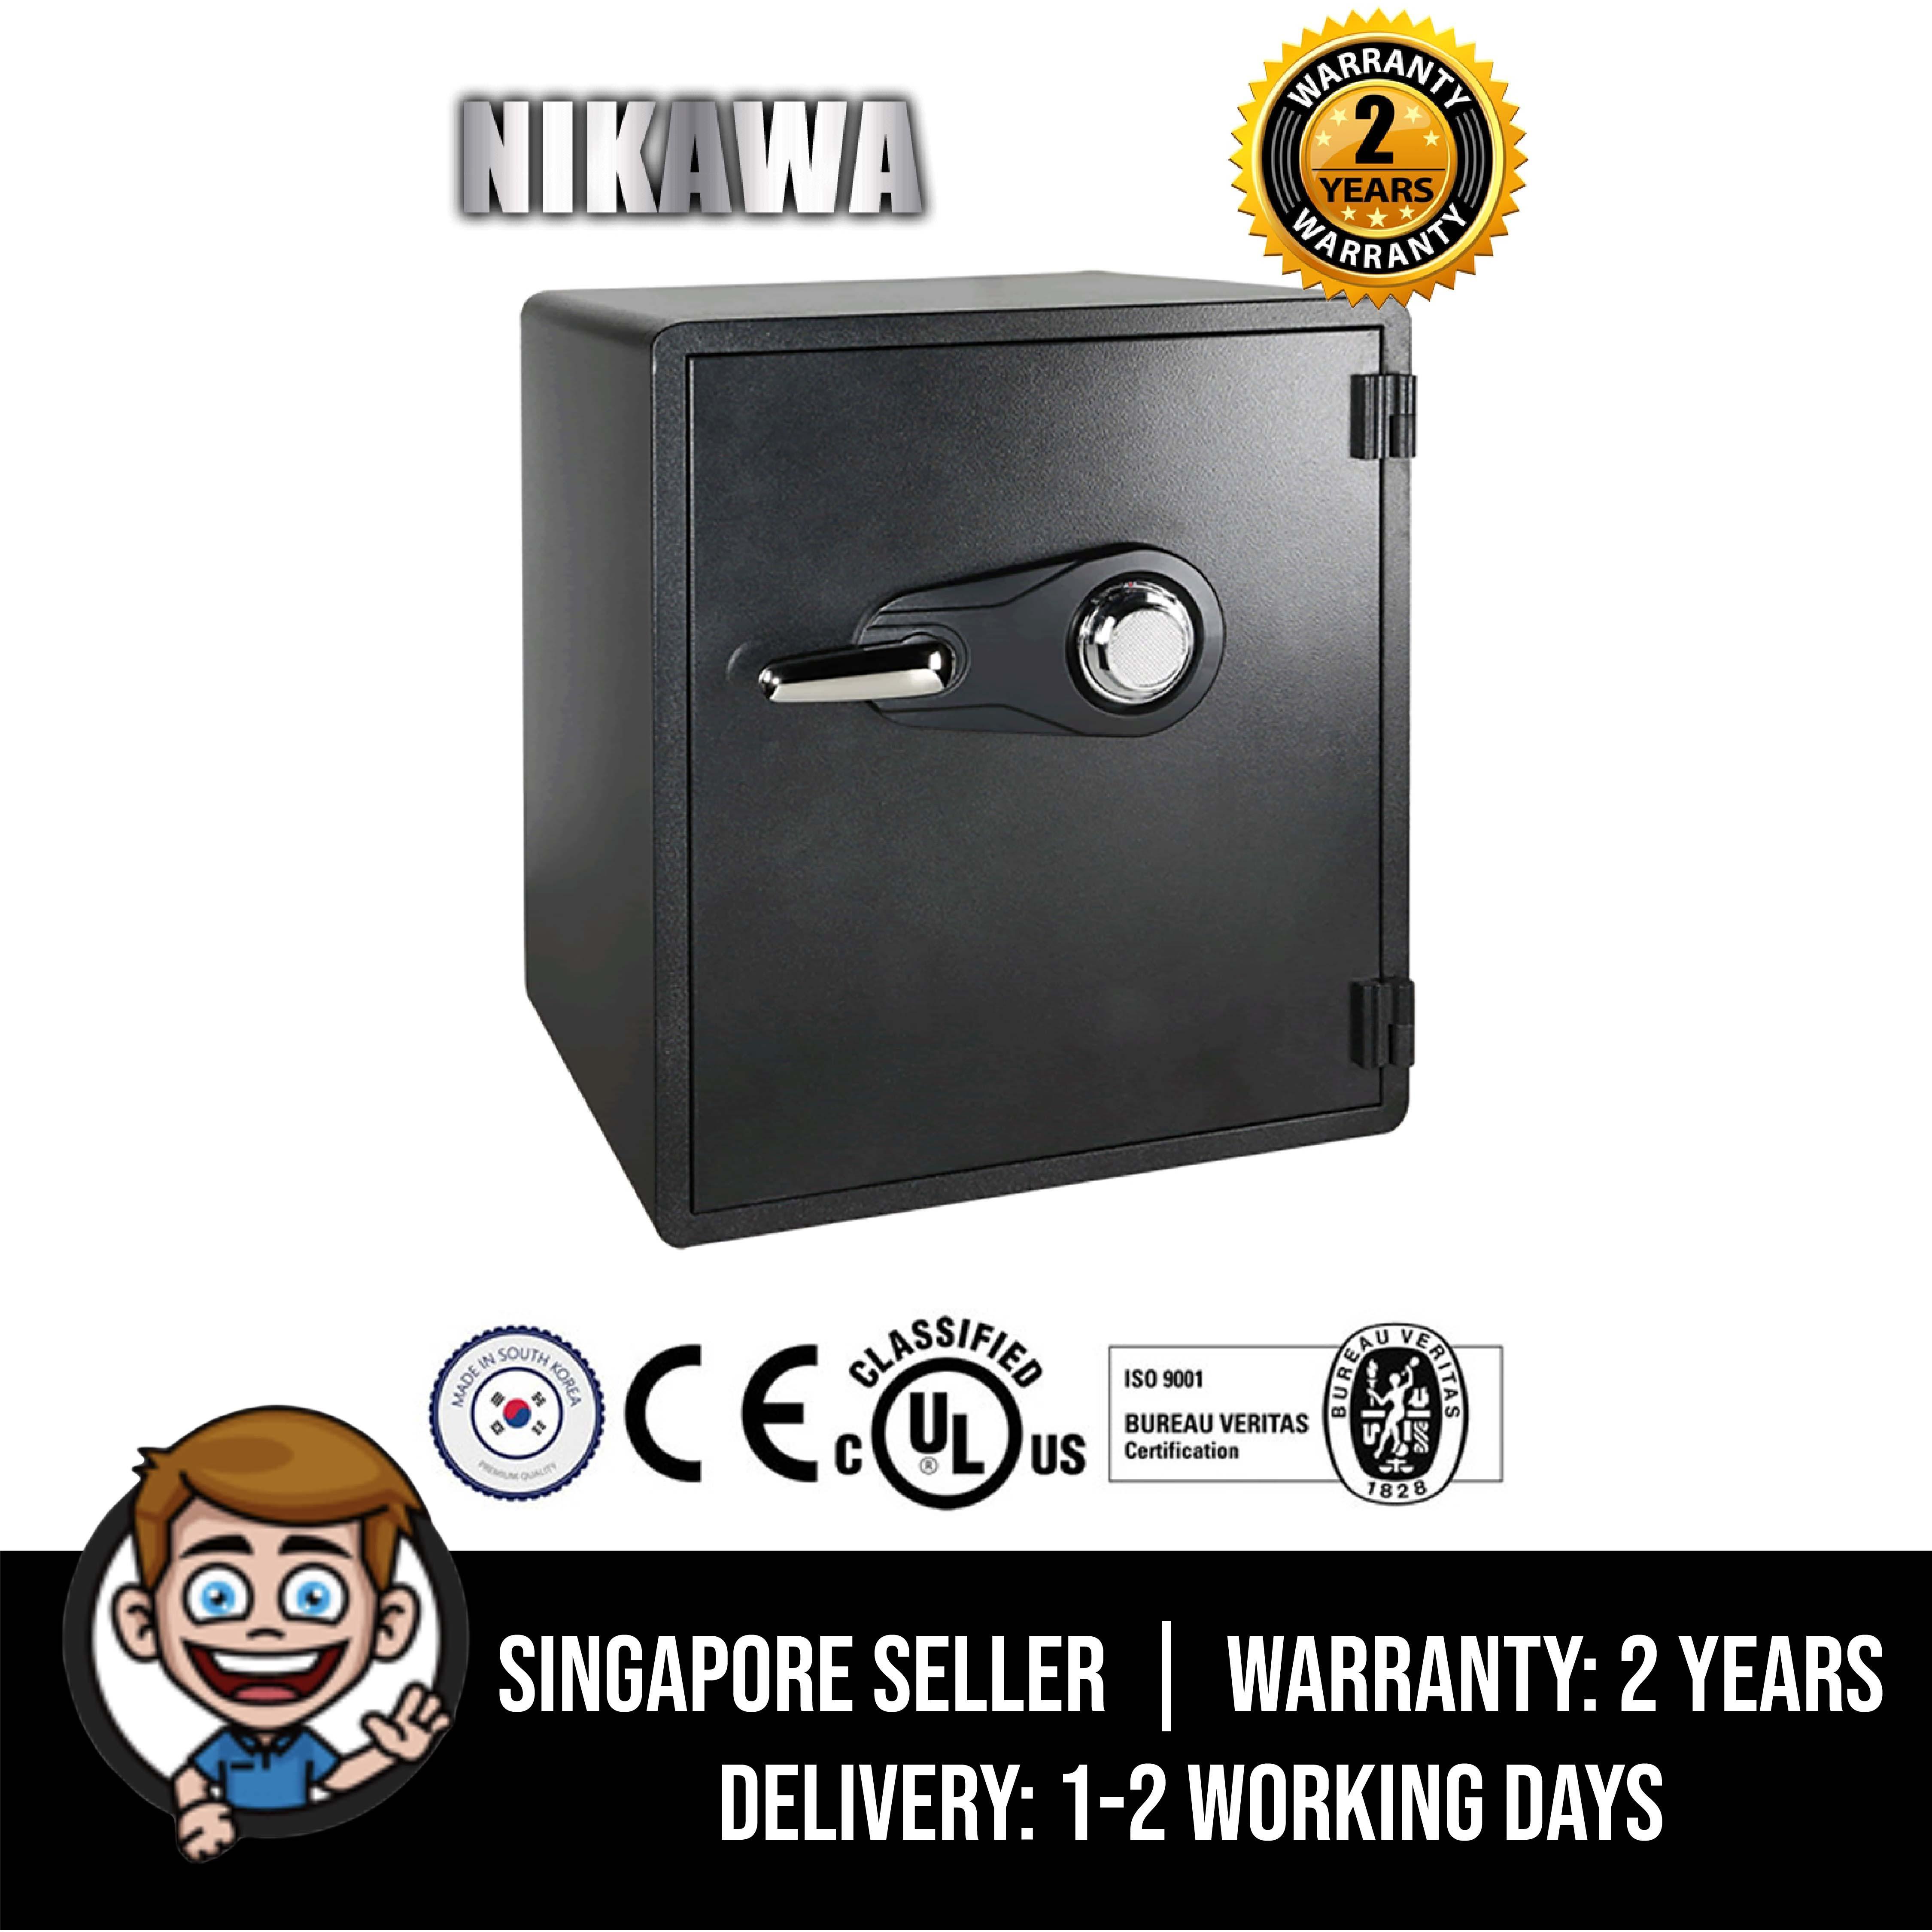 Nikawa SWF Combination Safe 2420C